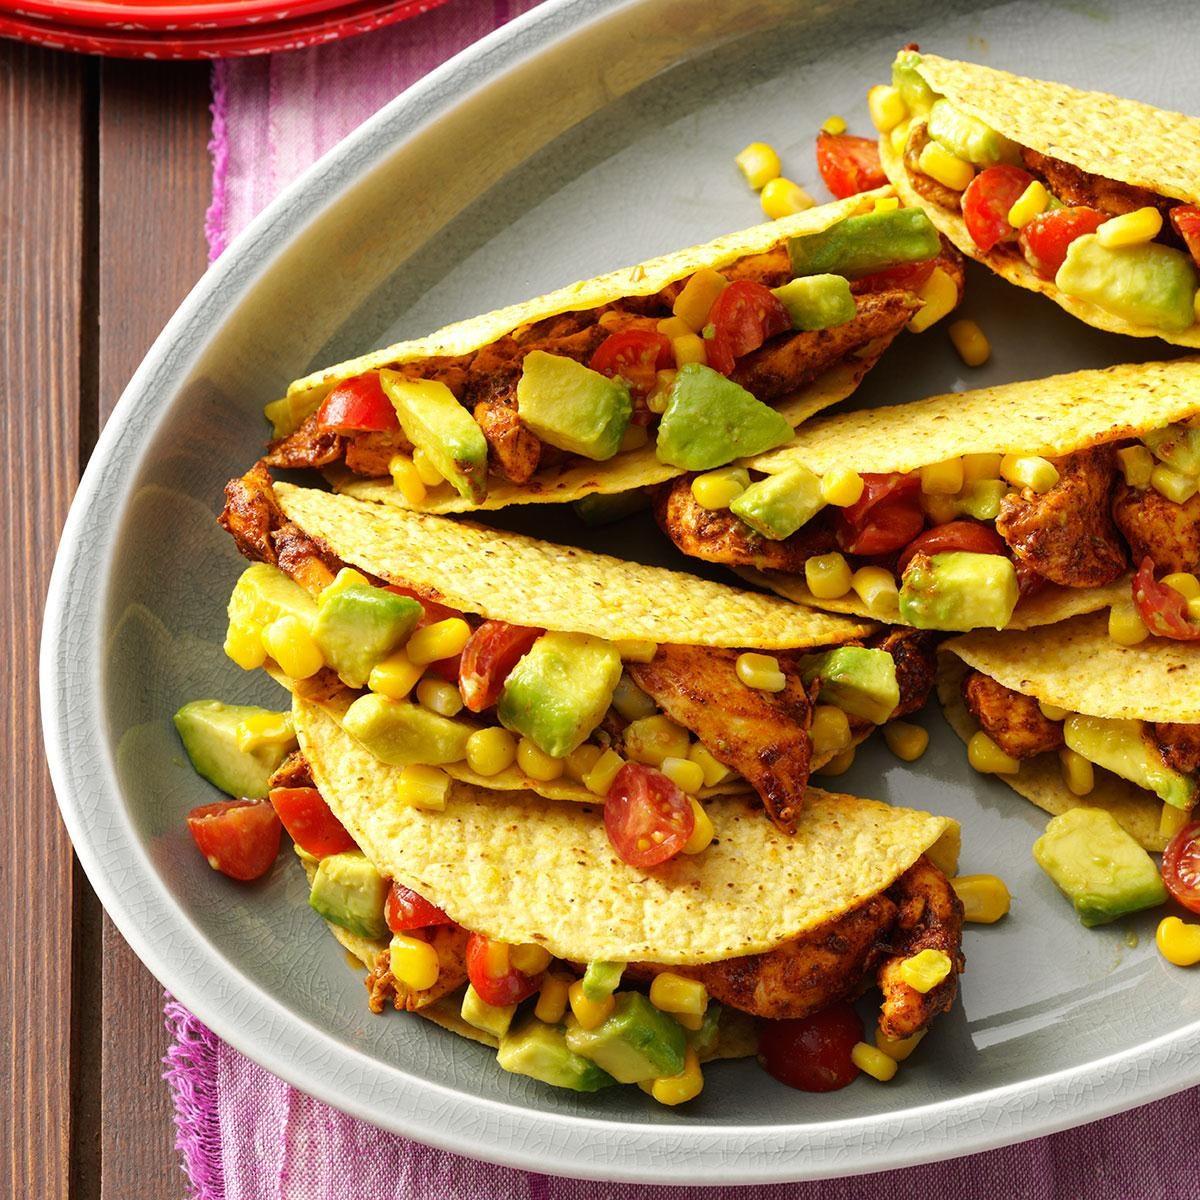 Chicken Tacos with Avocado Salsa